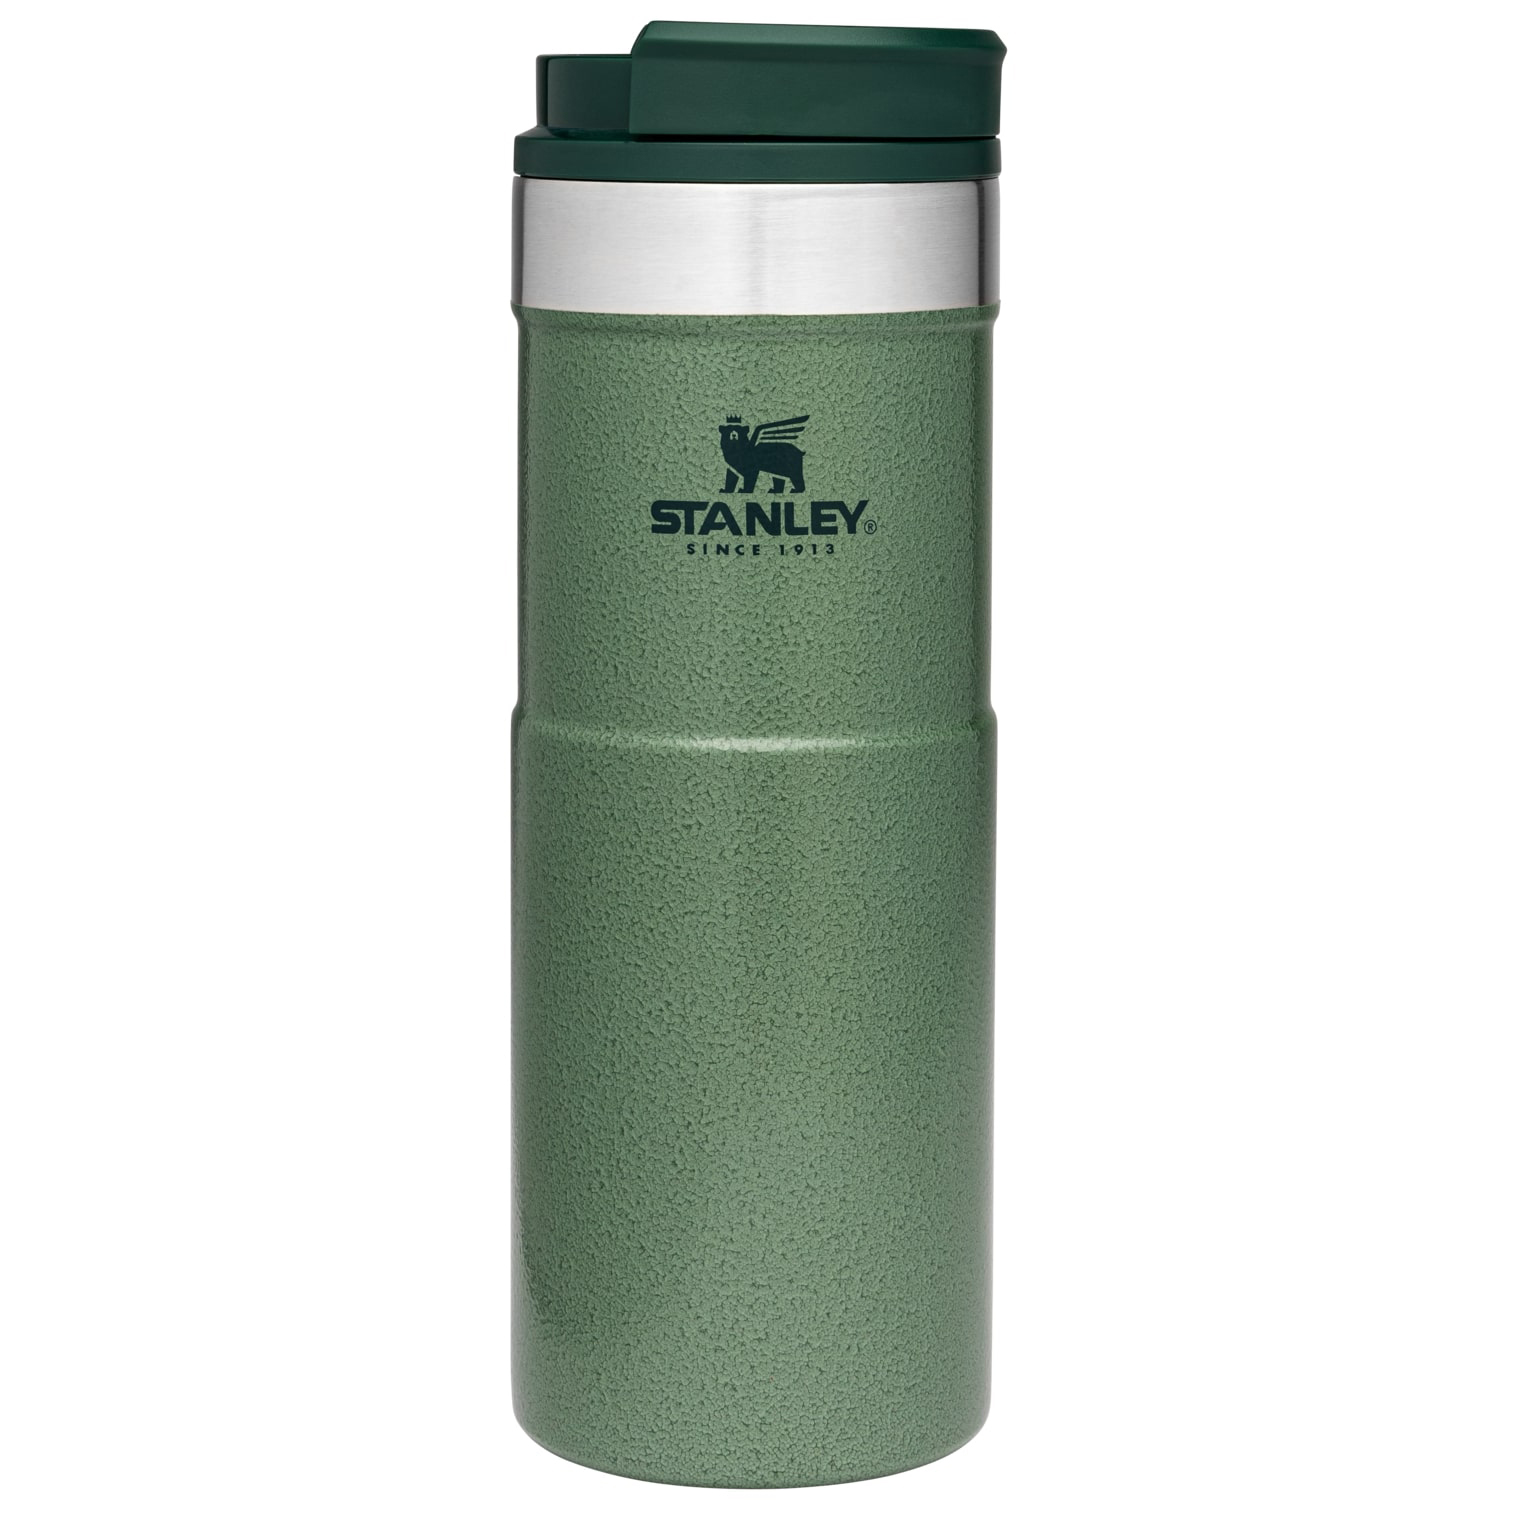 Stanley Classic The NeverLeak Travel Mug 16oz - 0.47L